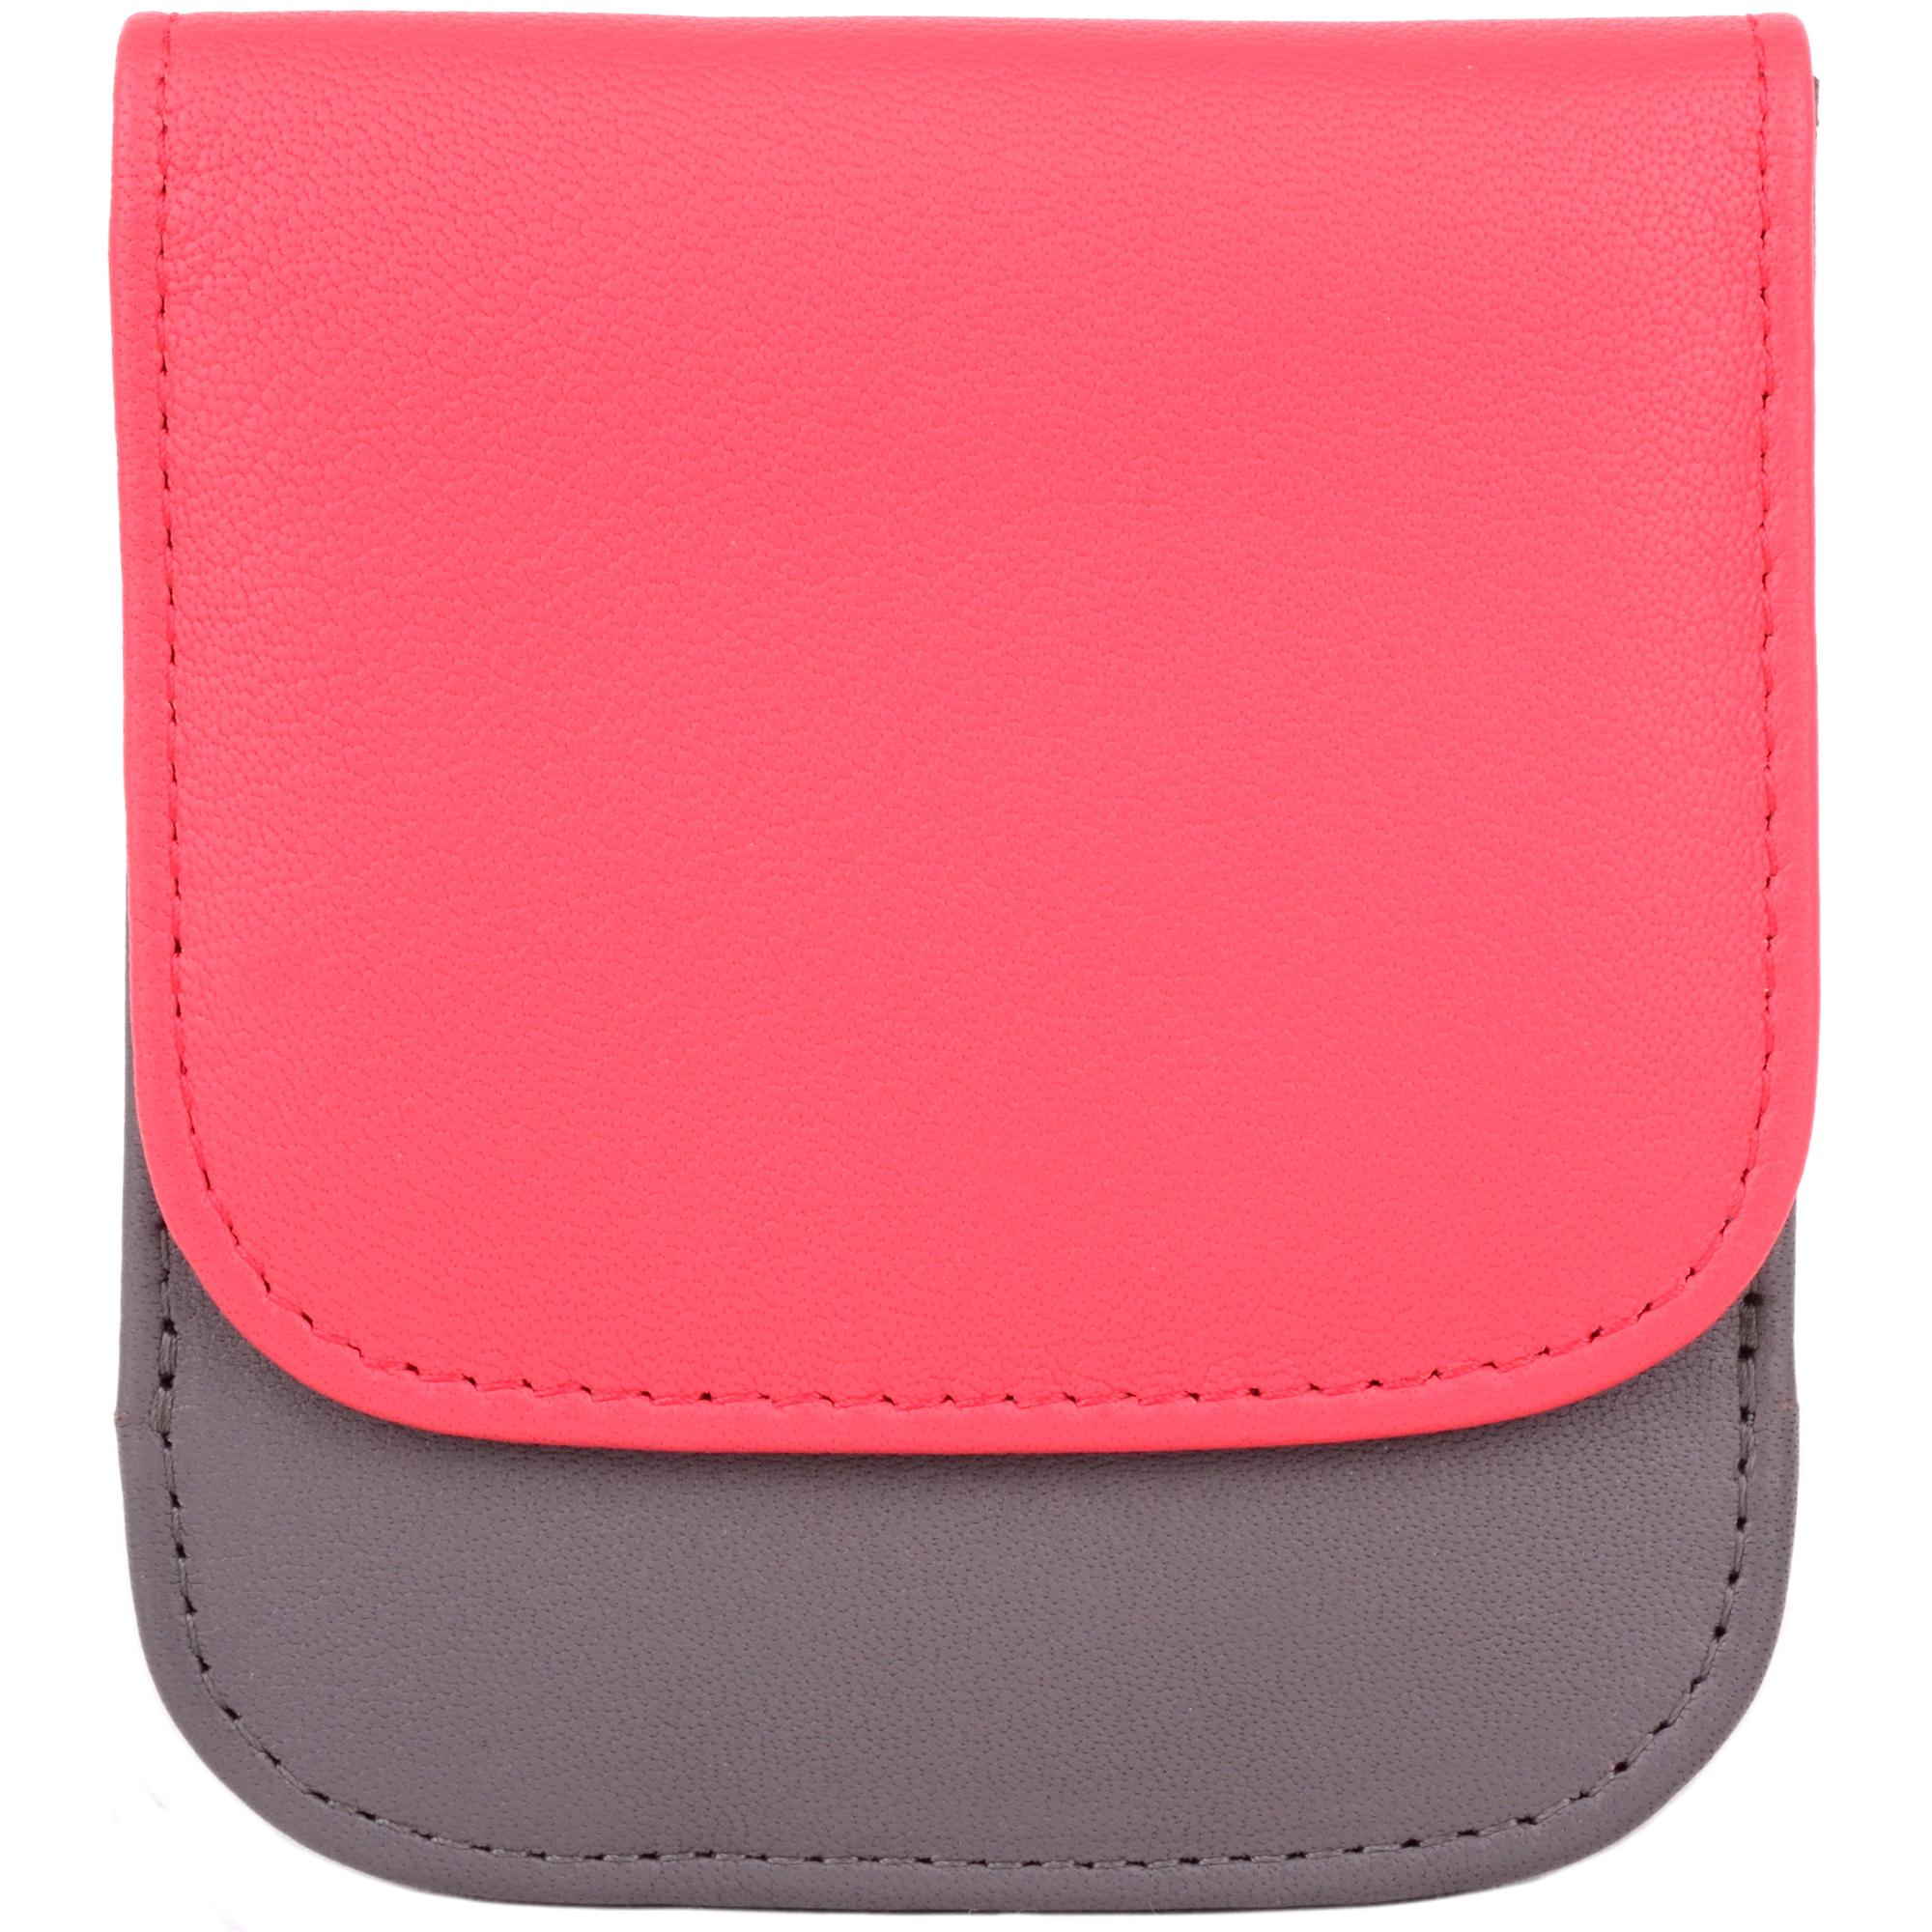 Soft Leather Coin Holder - Allie - Elephant